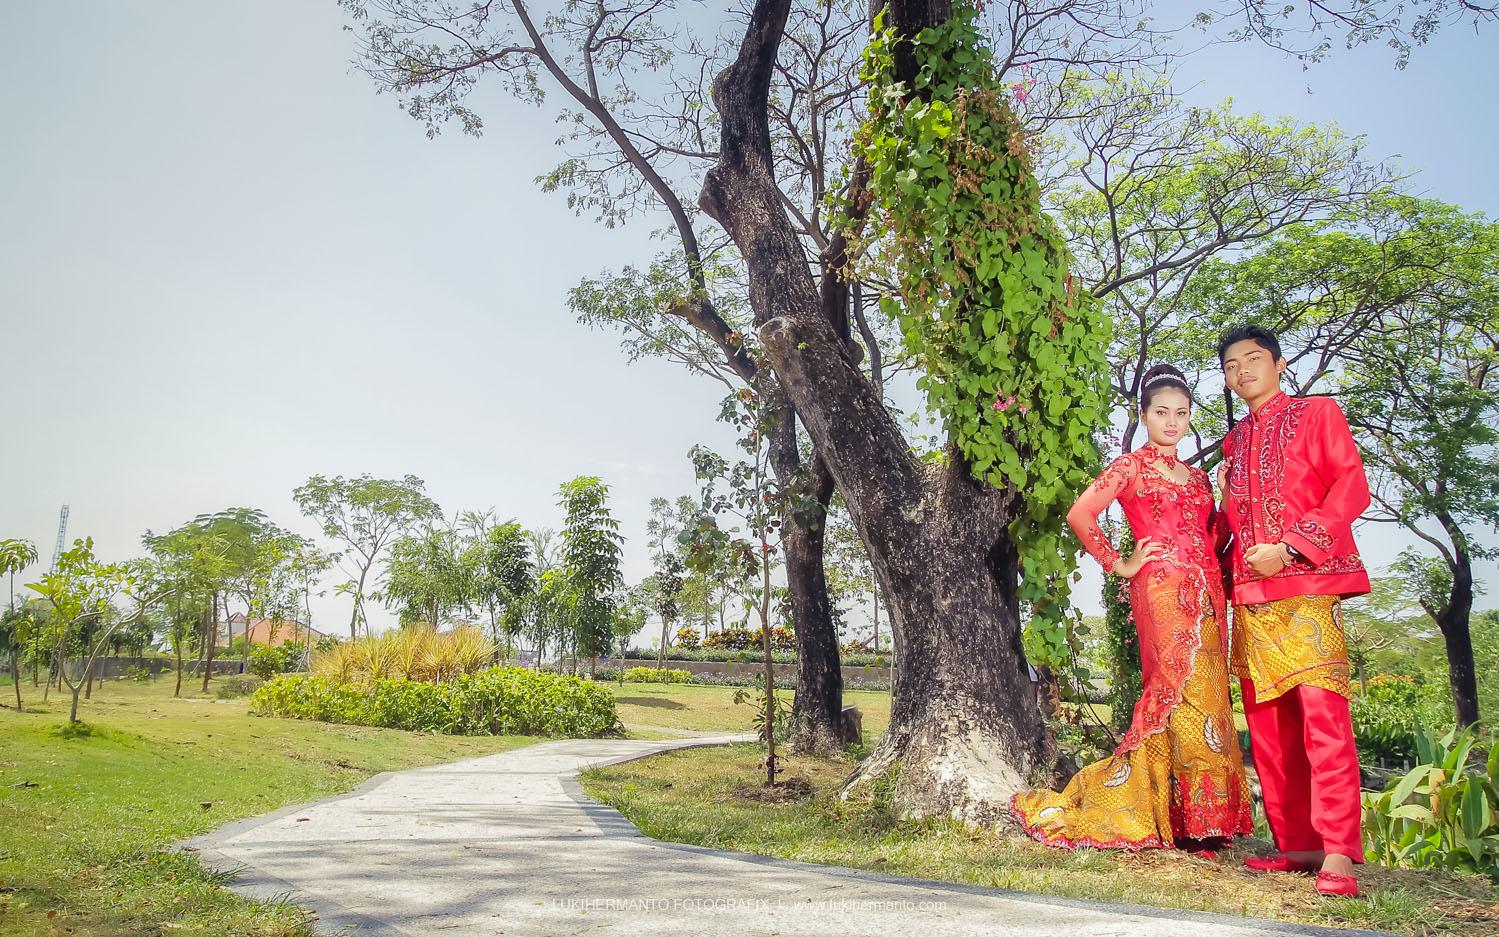 Lokasi Foto Prewedding Surabaya Outdoor Lukihermanto Blog Kebun Bibit Kota